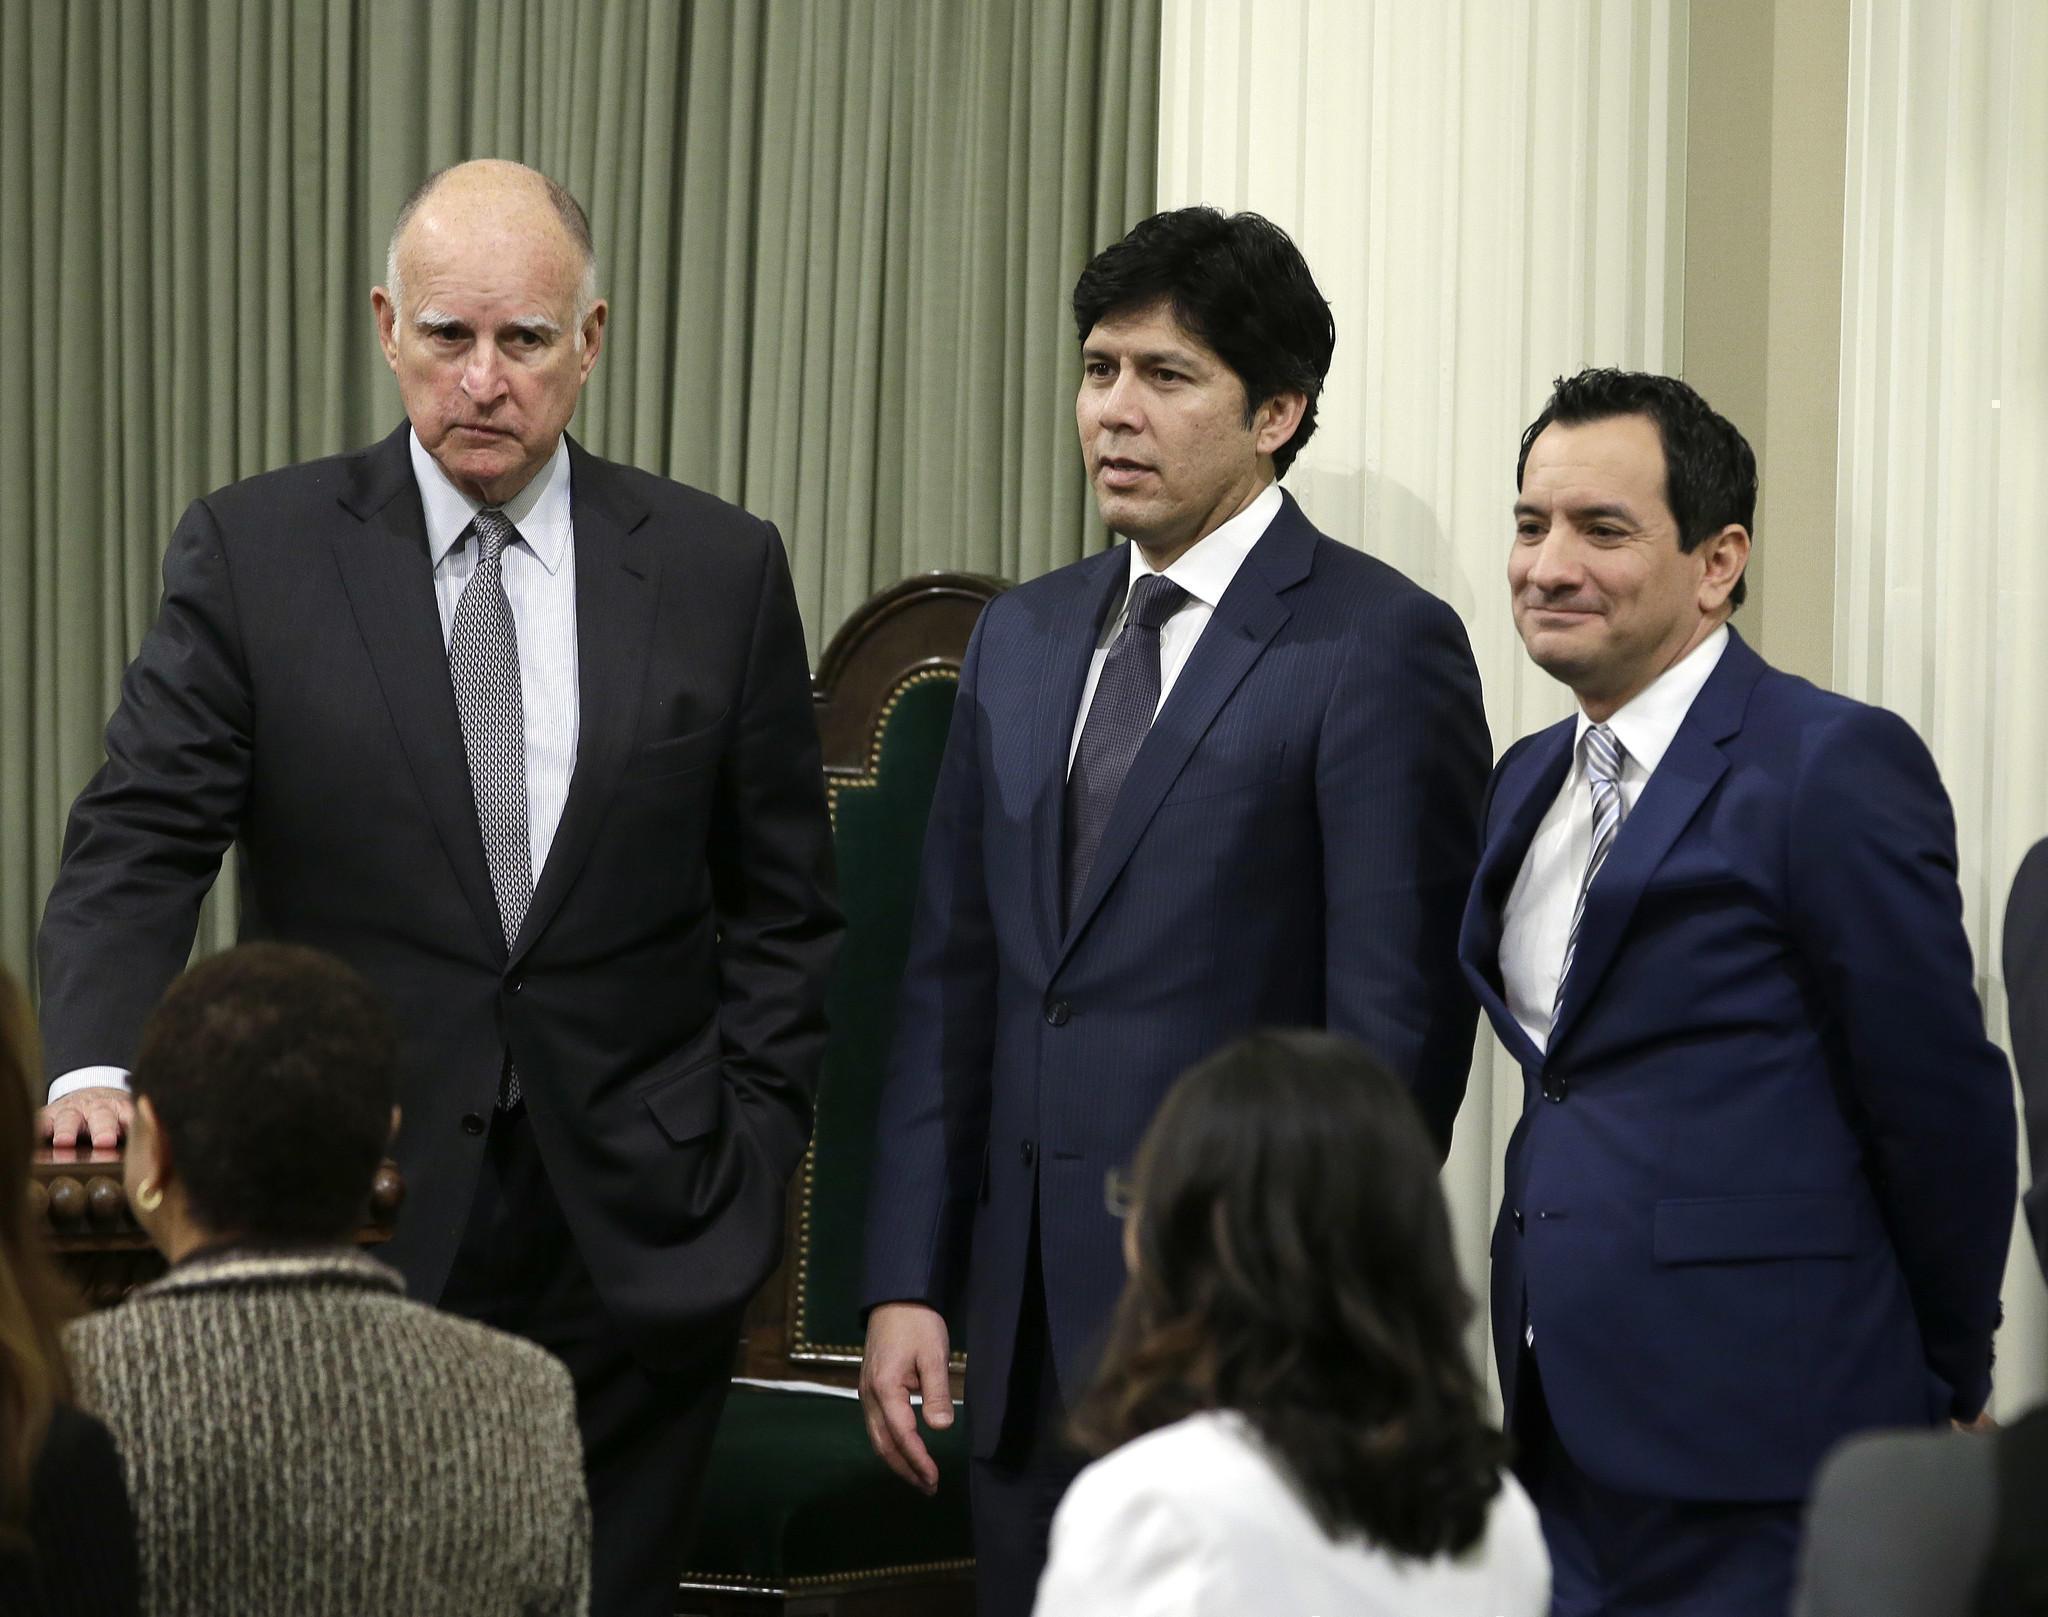 Gov. Jerry Brown, left, with Senate President Pro Tem Kevin de León (D-Los Angeles), center, and Assembly Speaker Anthony Rendon (D-Paramount). (Rich Pedroncelli / Associated Press)